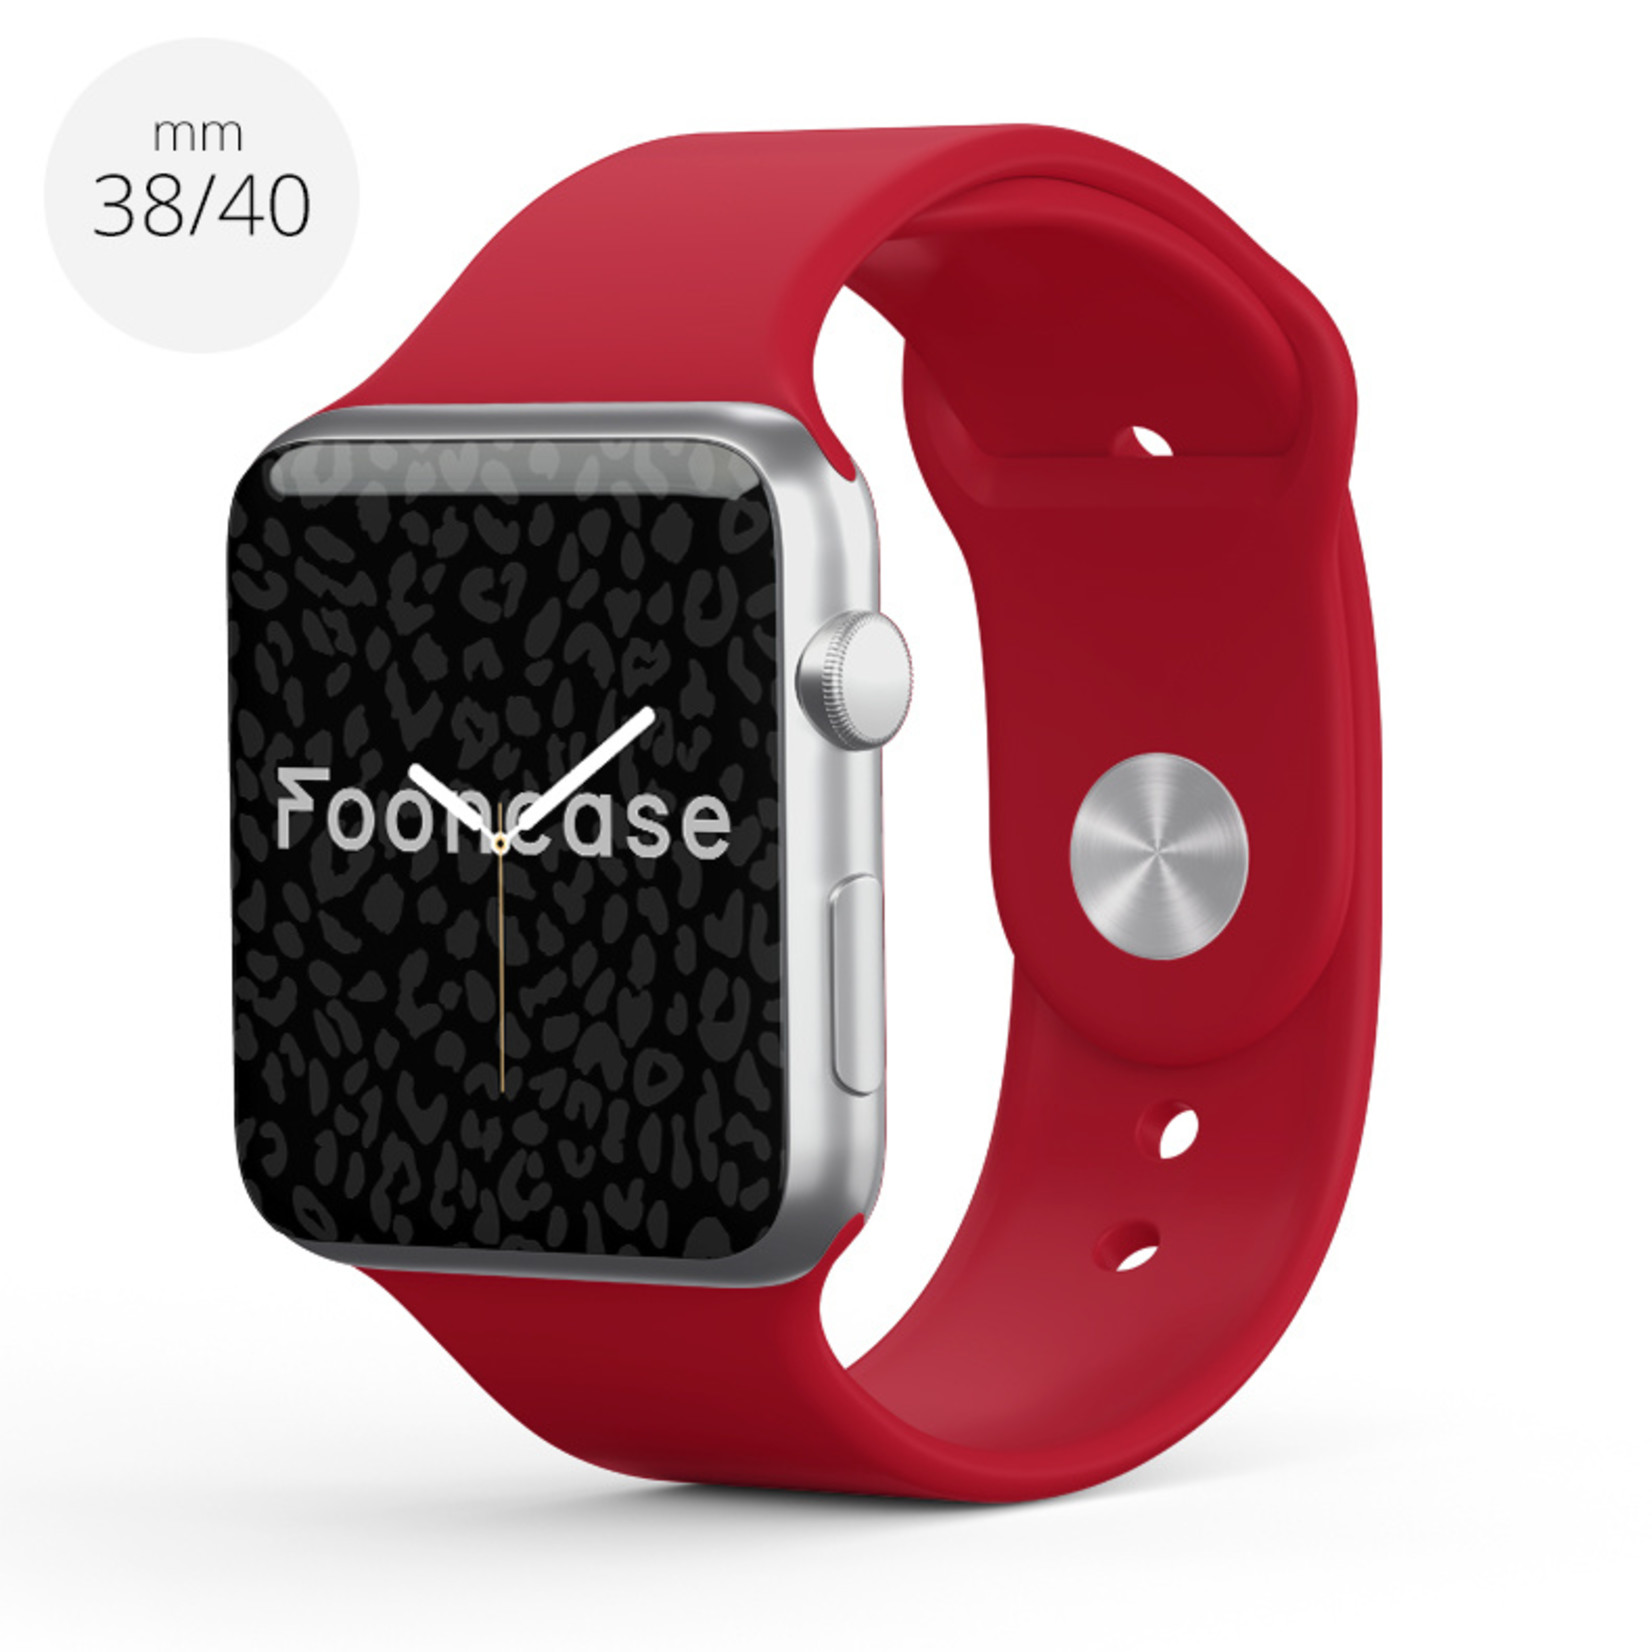 FOONCASE Apple Watch Series (1 t/m 6 / SE) - Red velvet - 38/40mm